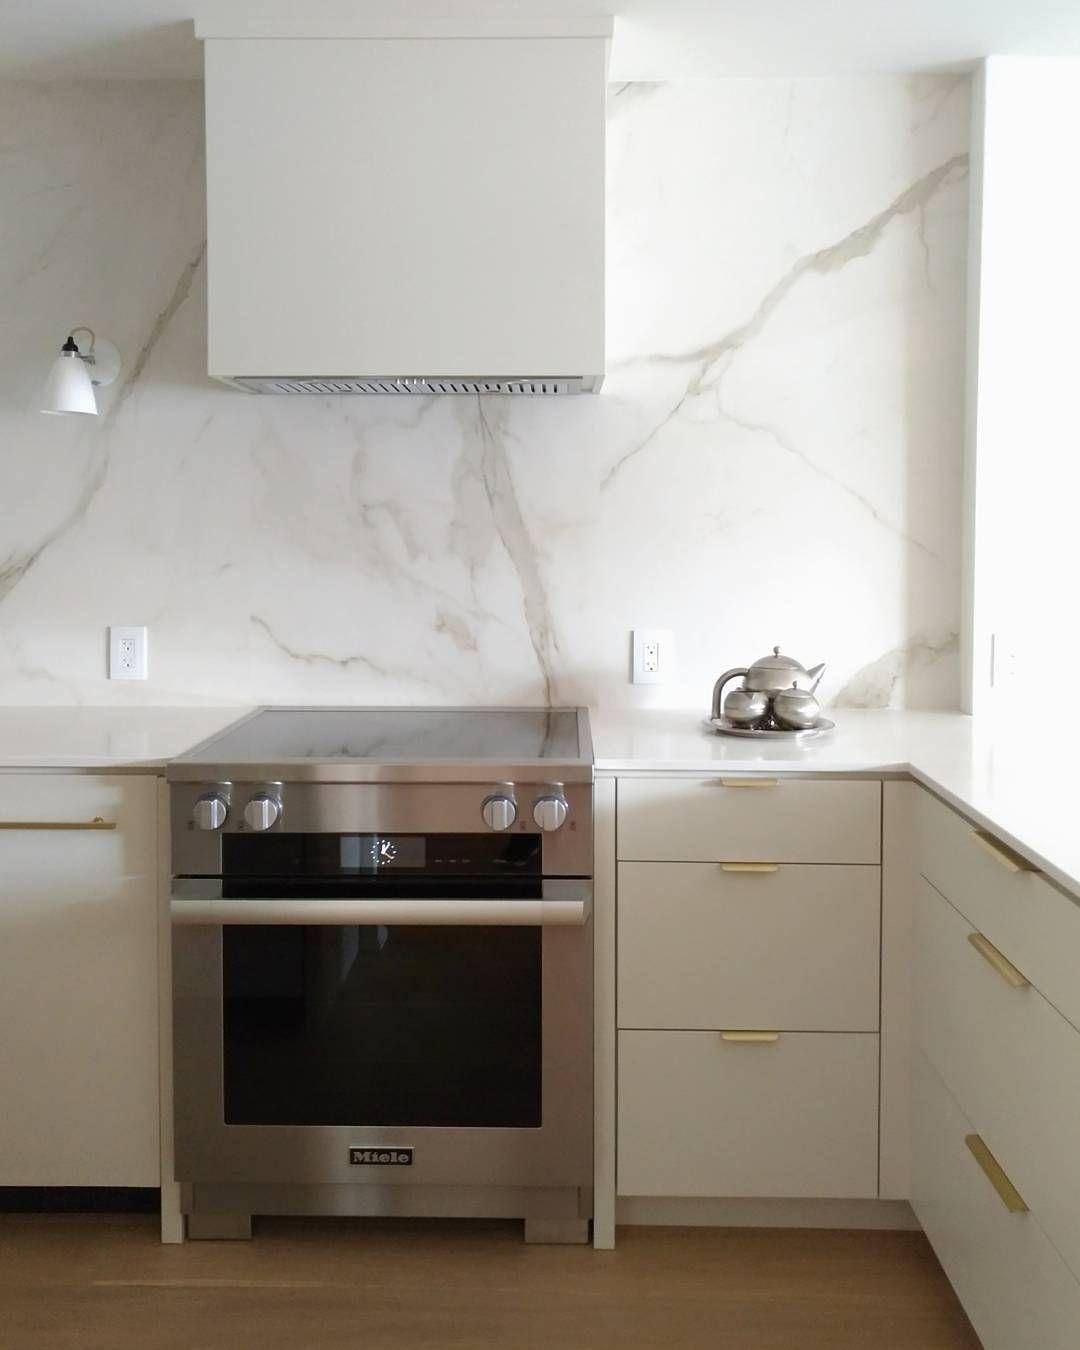 Cabinets: BM Halo Porcelain slab backsplash   Kitchen Beauty   Pinterest